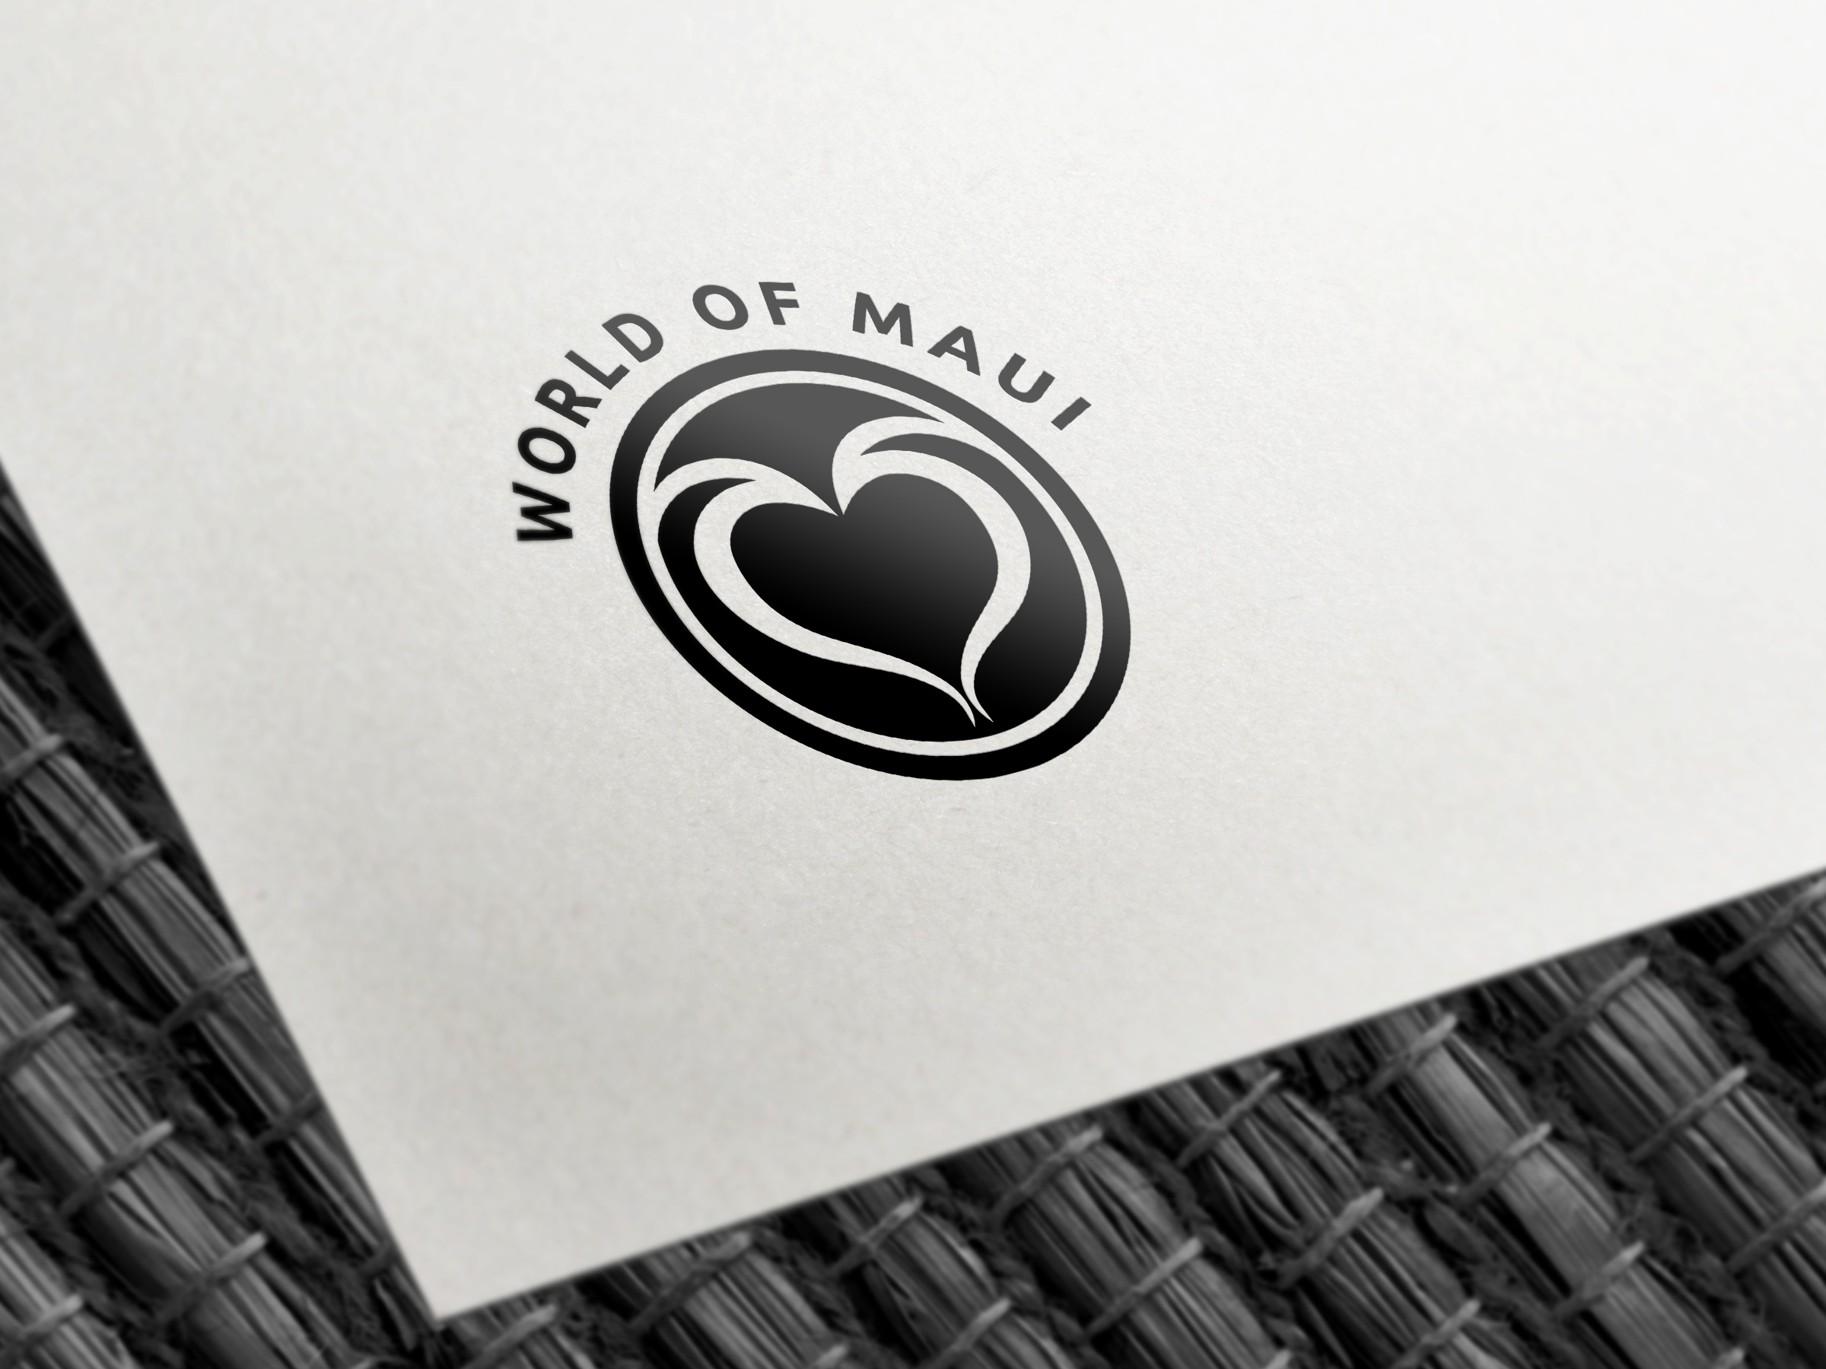 Návrh loga - World of Maui | VV grafické studio